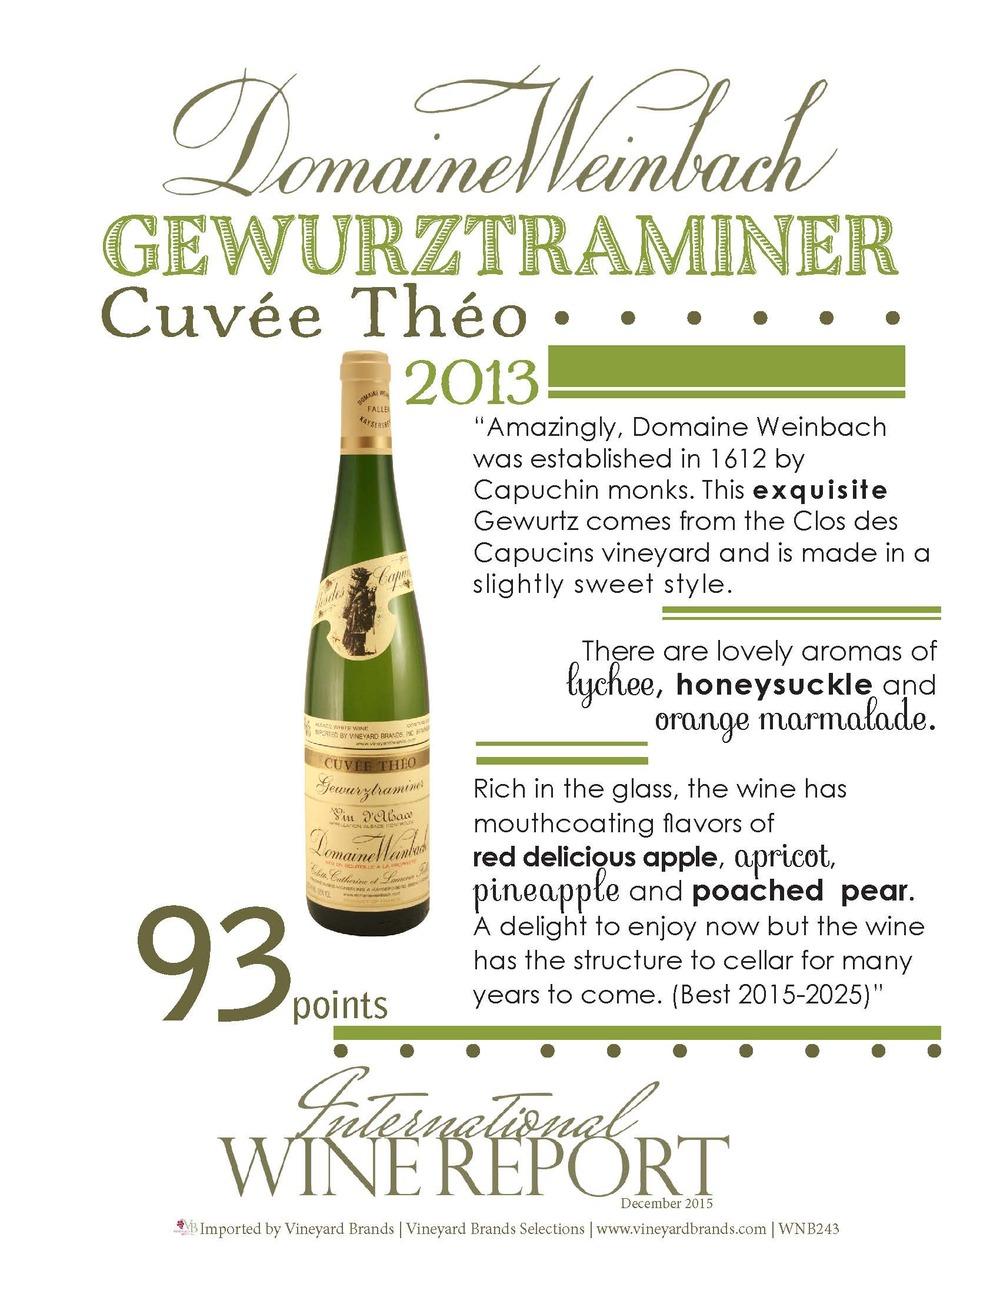 DomaineWeinbach Gewurtztraminer Cuvee Theo 2013